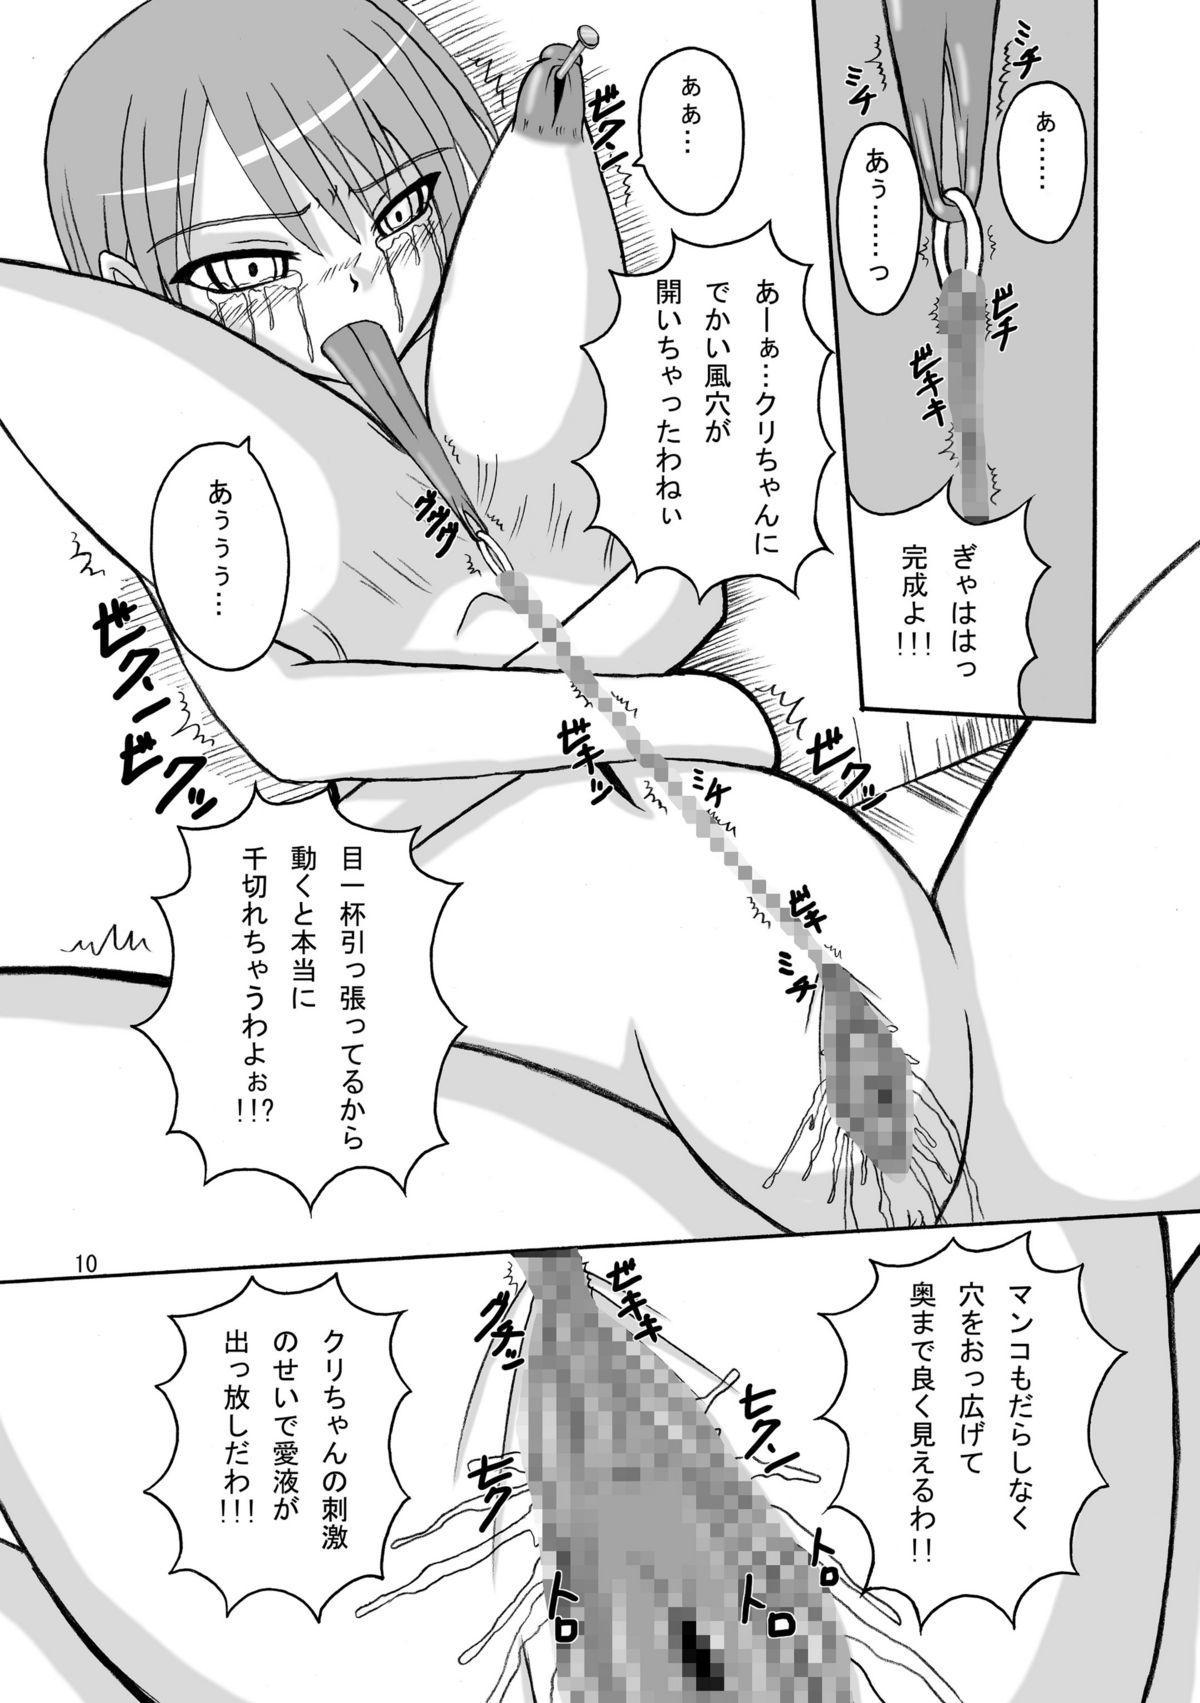 Jump Tales 5 San P Nami Baku More Condom Nami vs Gear3 vs Marunomi Hebihime 8